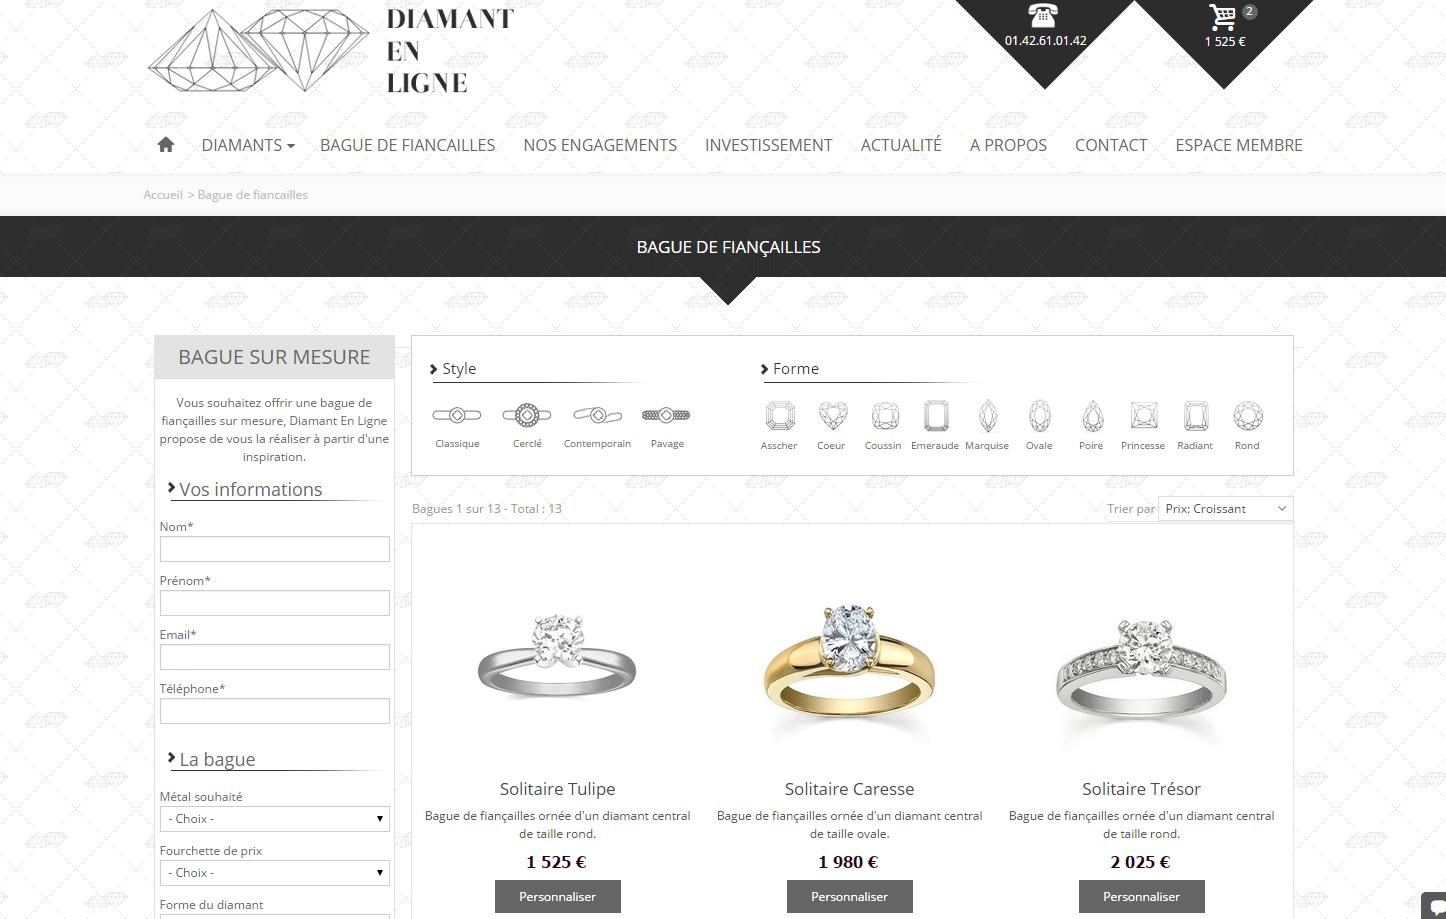 Diamant-En-Ligne